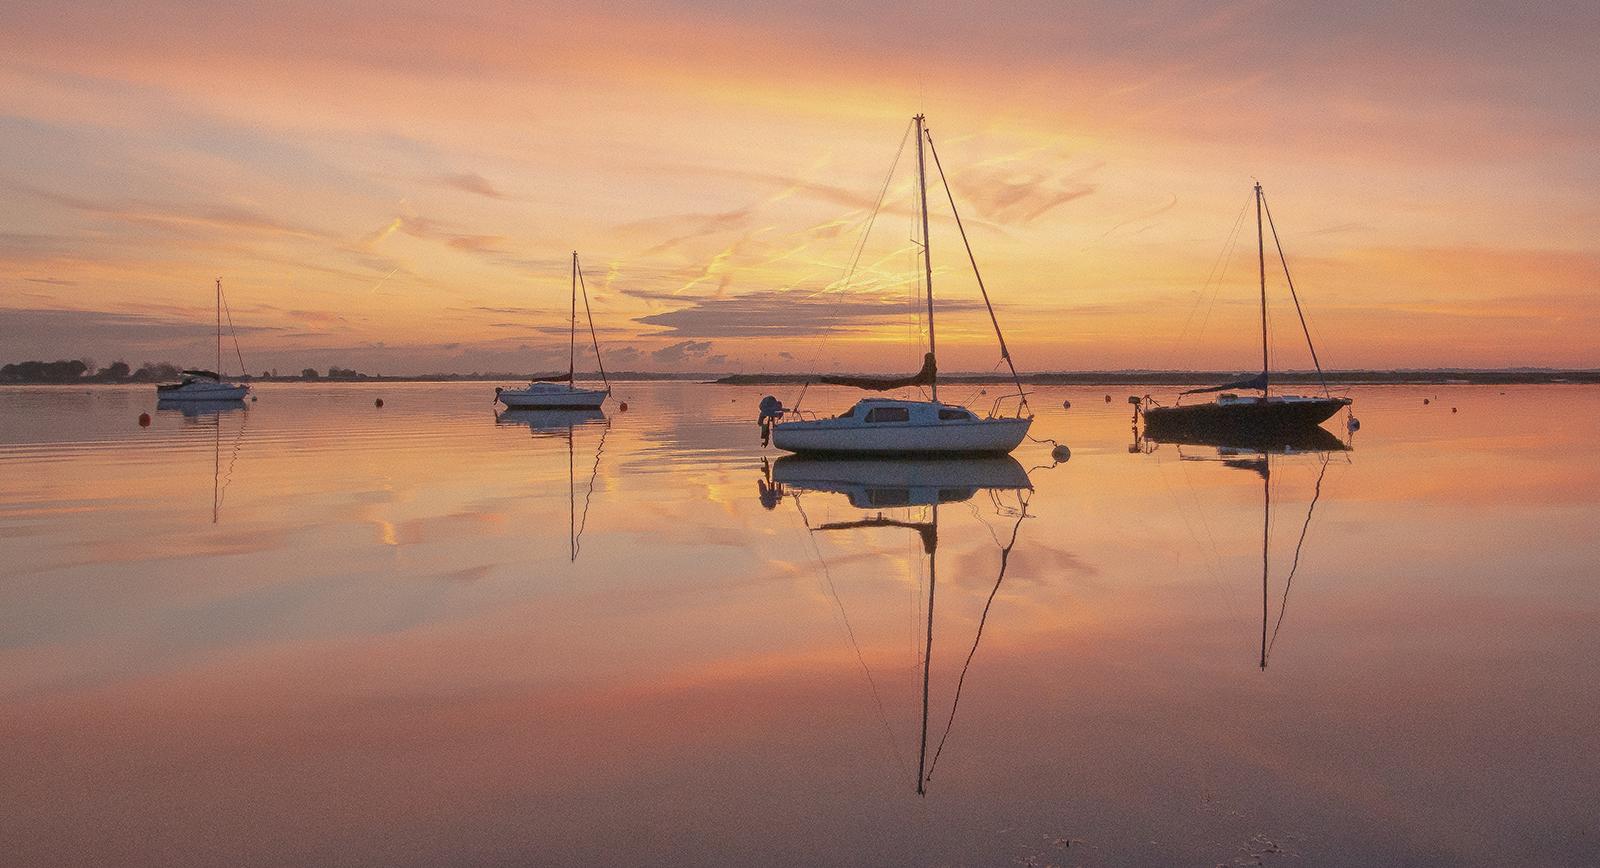 <h5>Heybridge Tranquility at Dawn</h5><p>Trevor Partridge - Beginner</p>